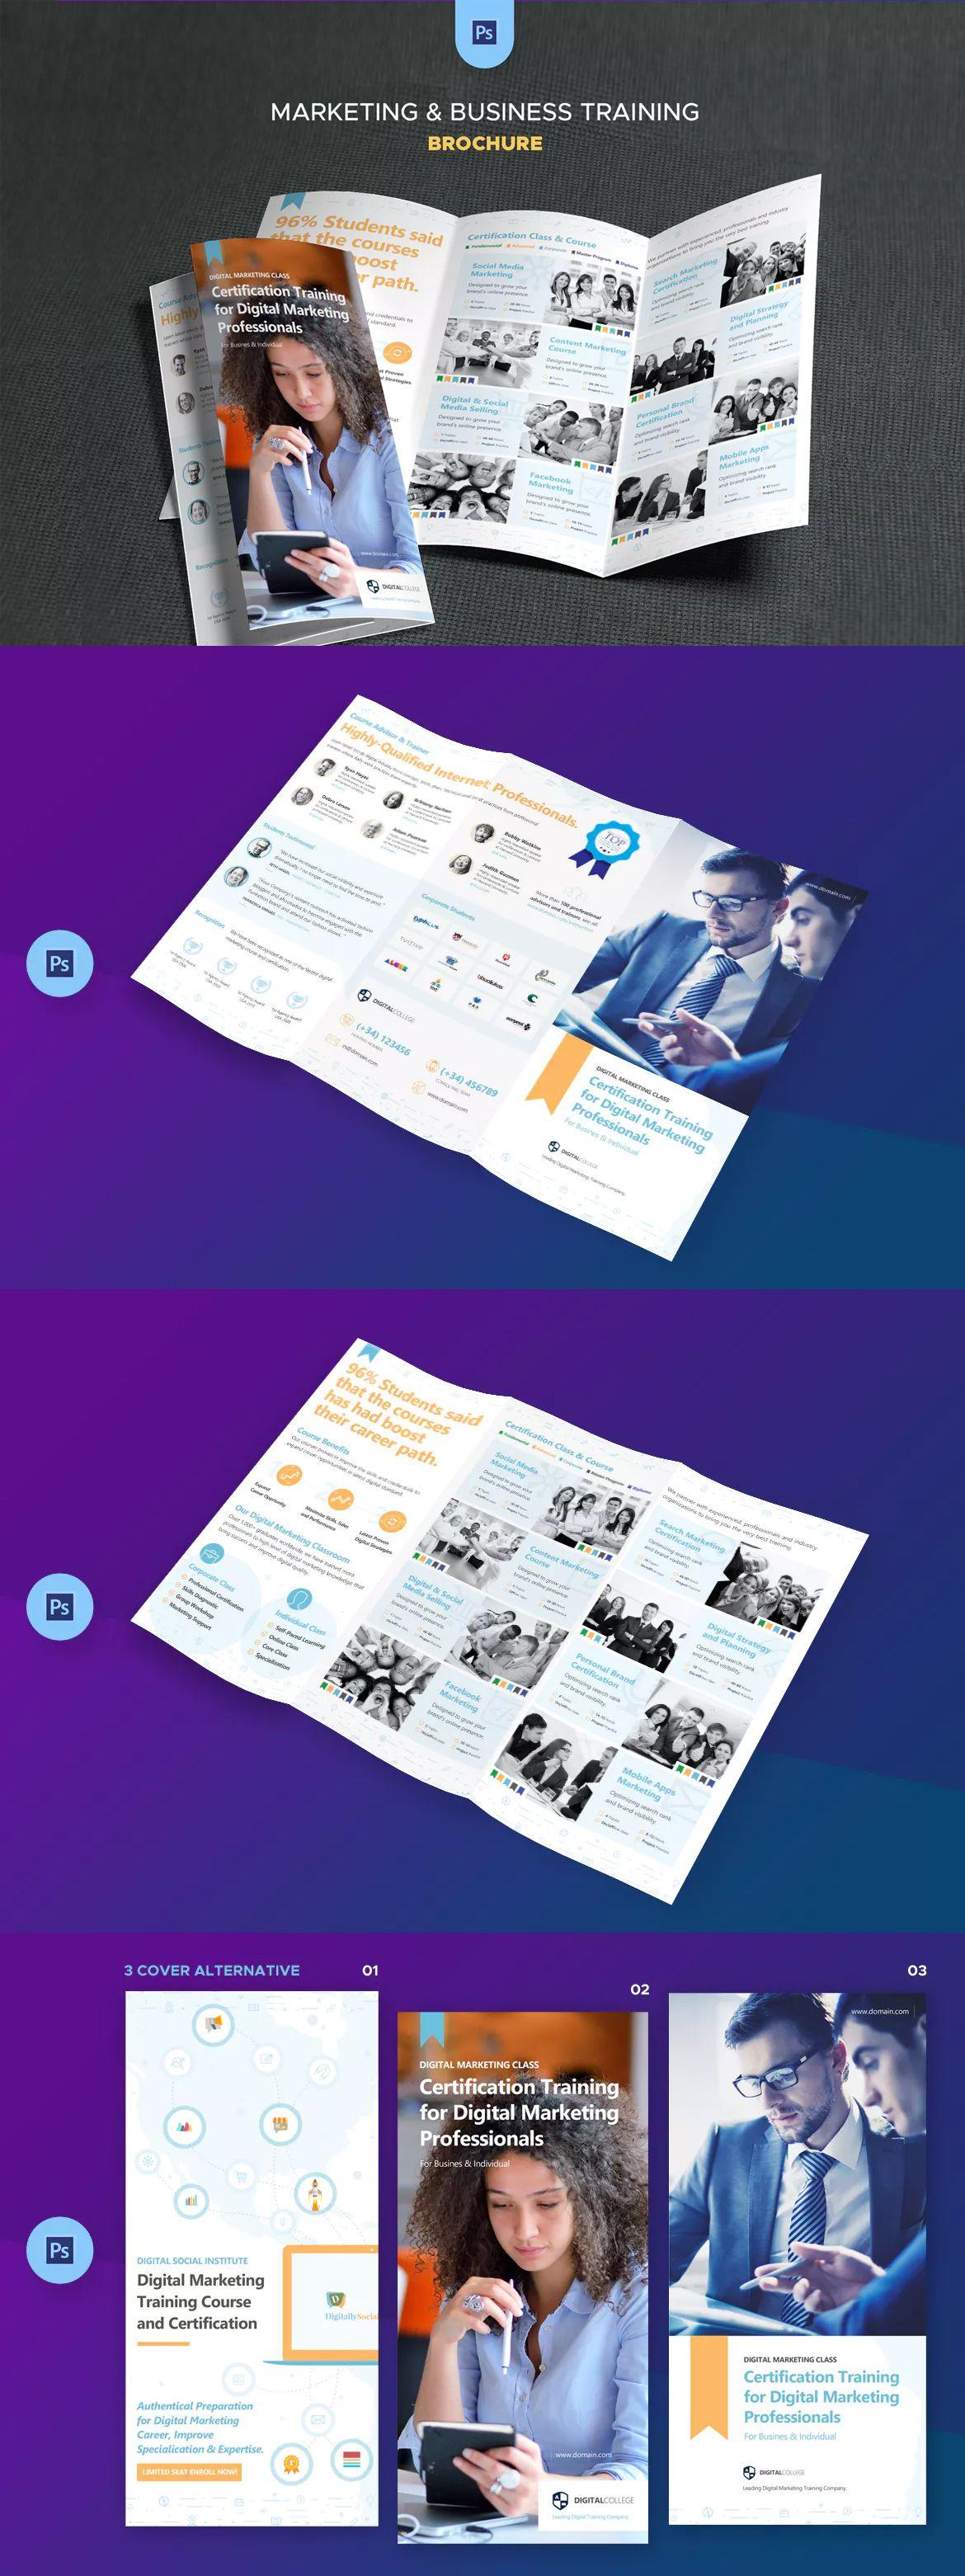 Marketing Business Training Brochure Template Psd Brochure